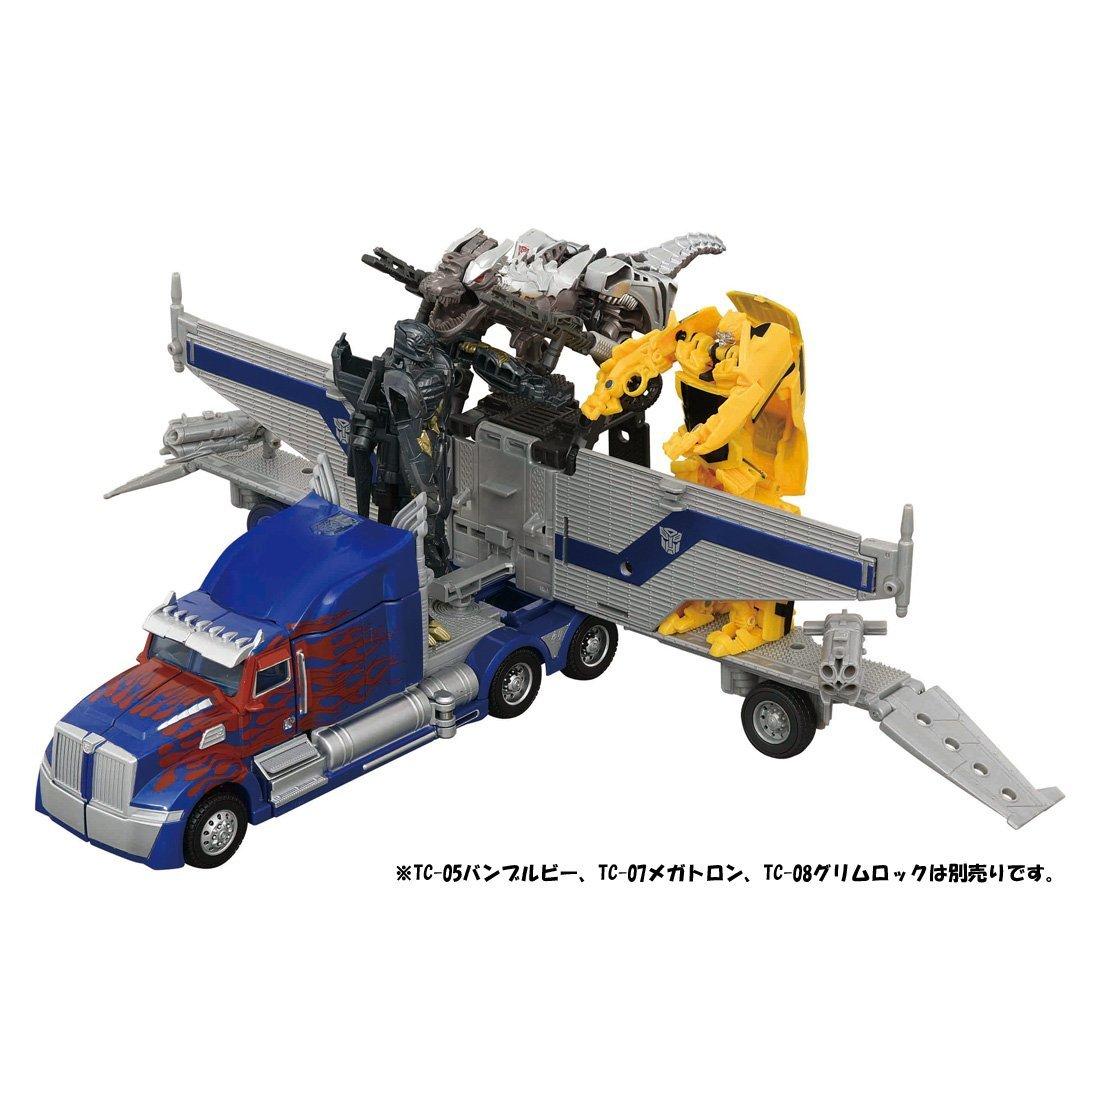 Transformers Turbo Change TC-01 OPTIMUS PRIME TC-02 BUMBLEBEE TC-03 MEGATRON TOP